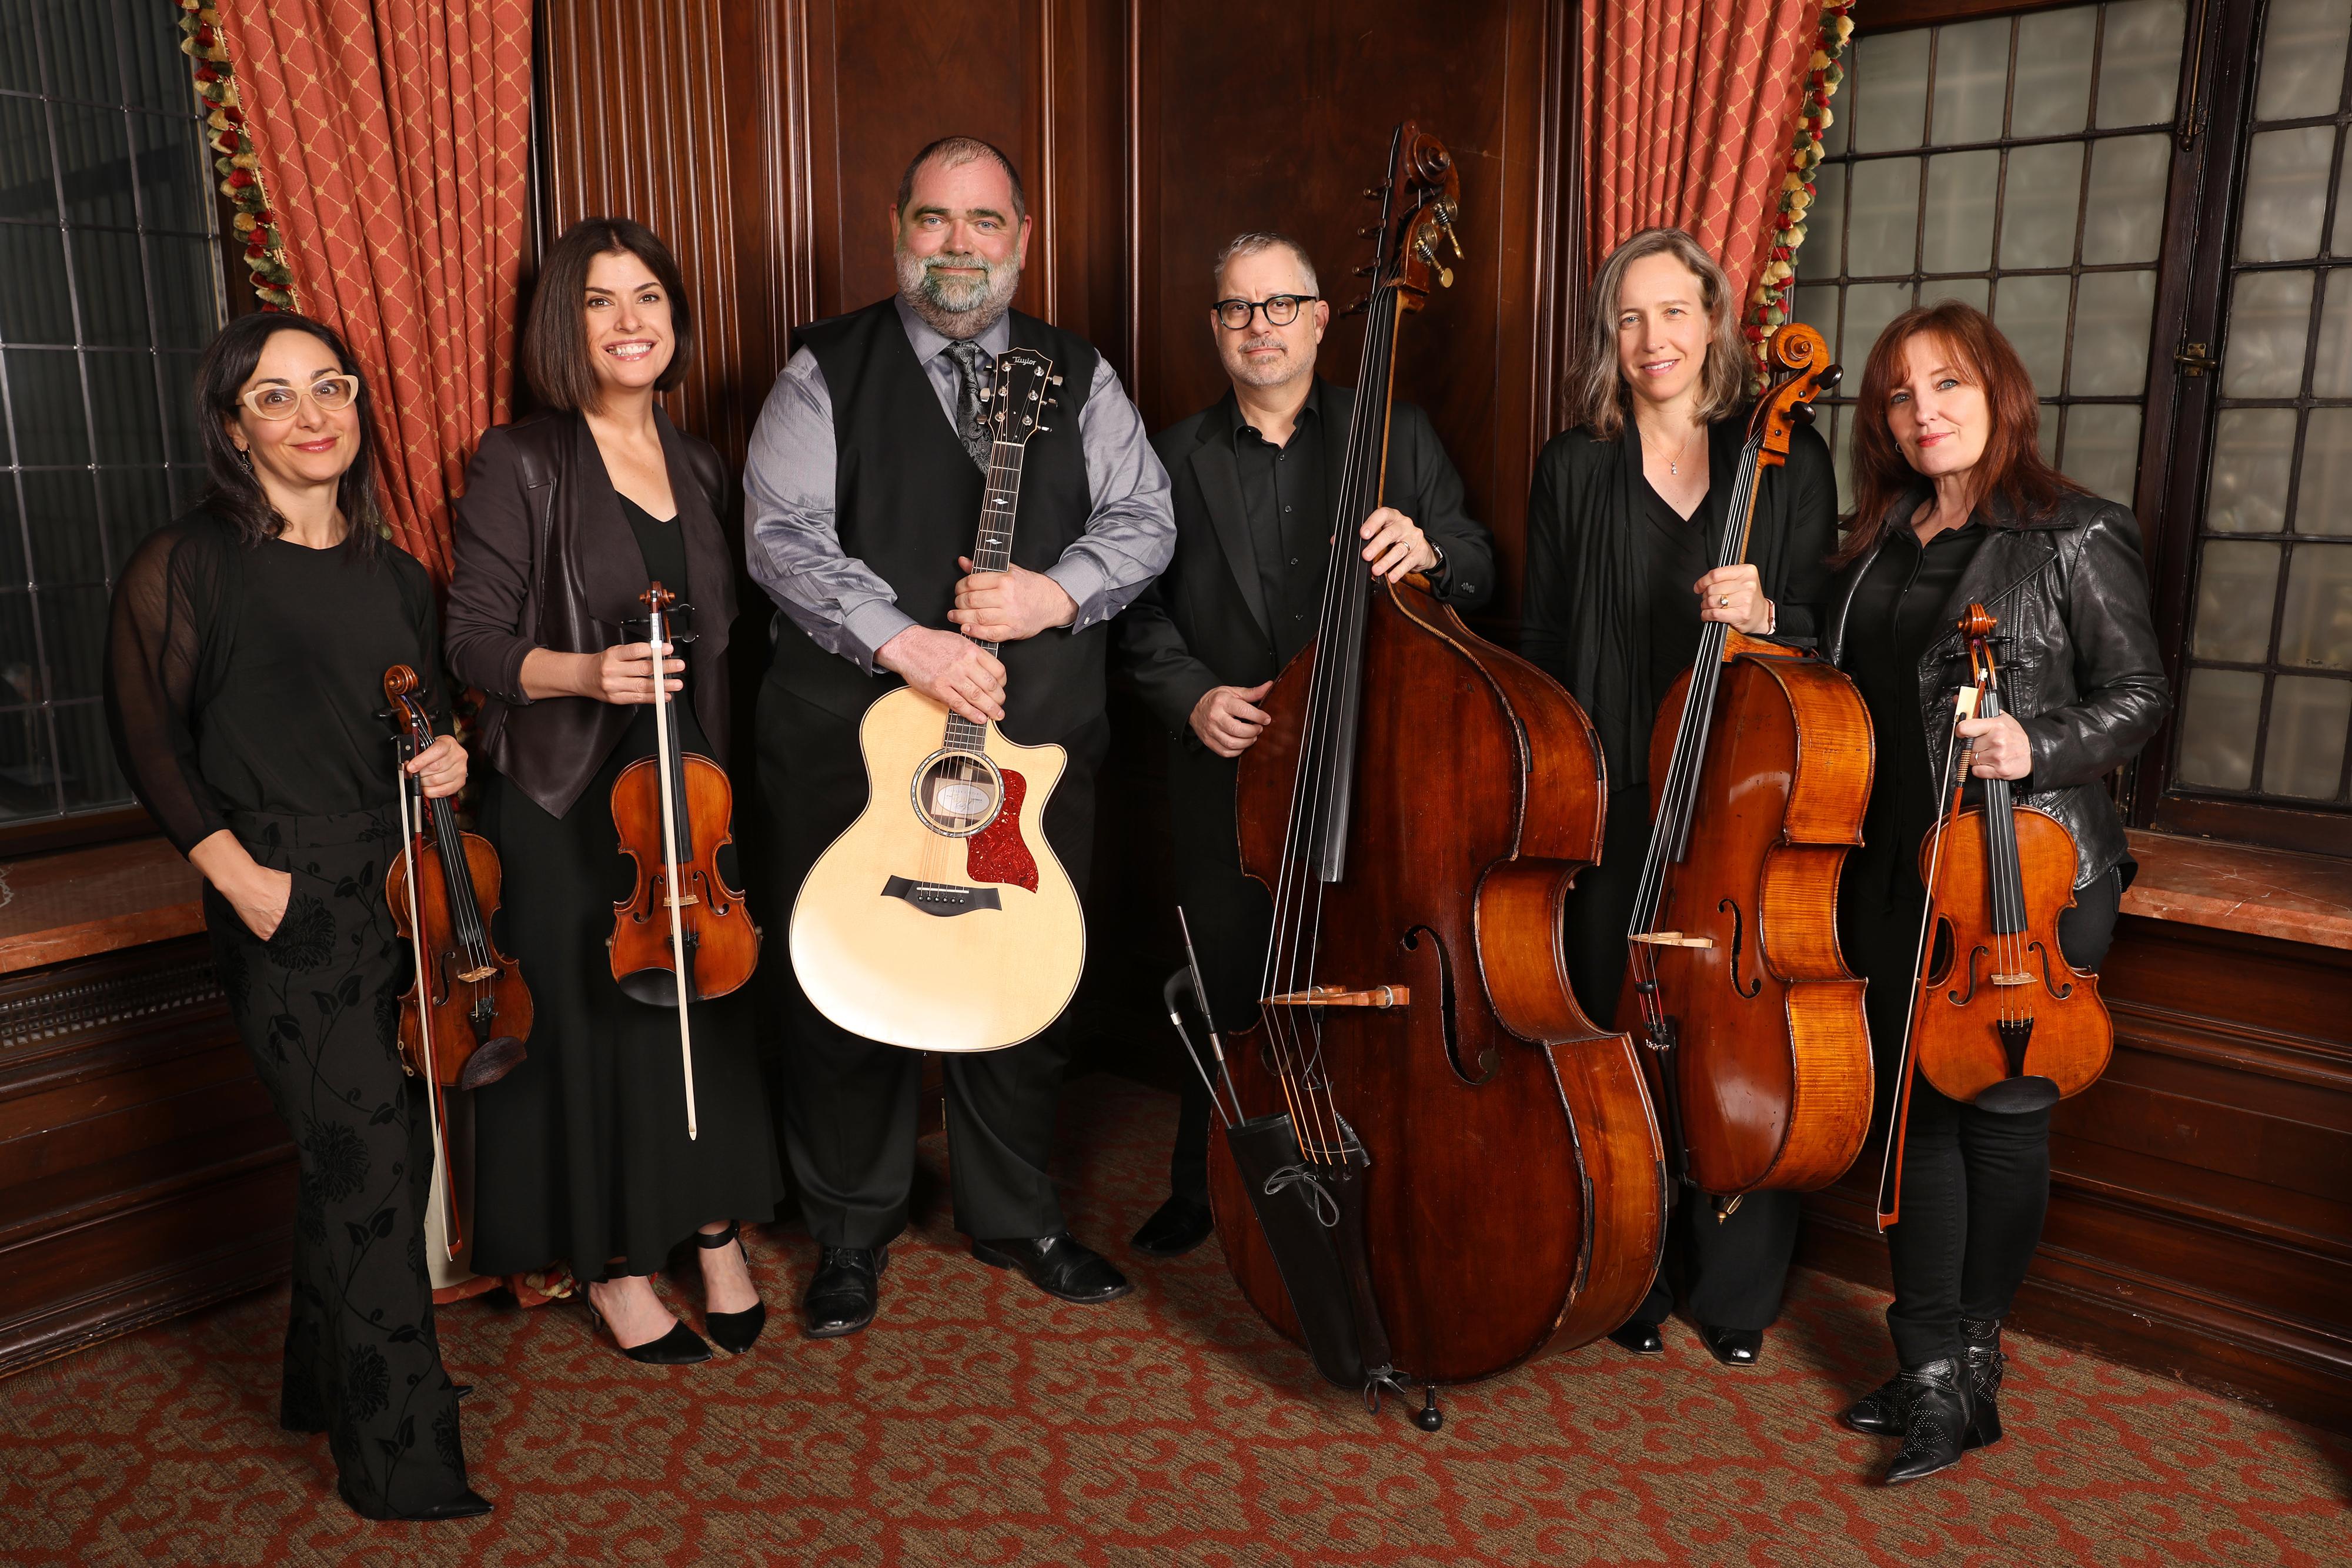 Zvonimir Tot's Jazz Stringtet